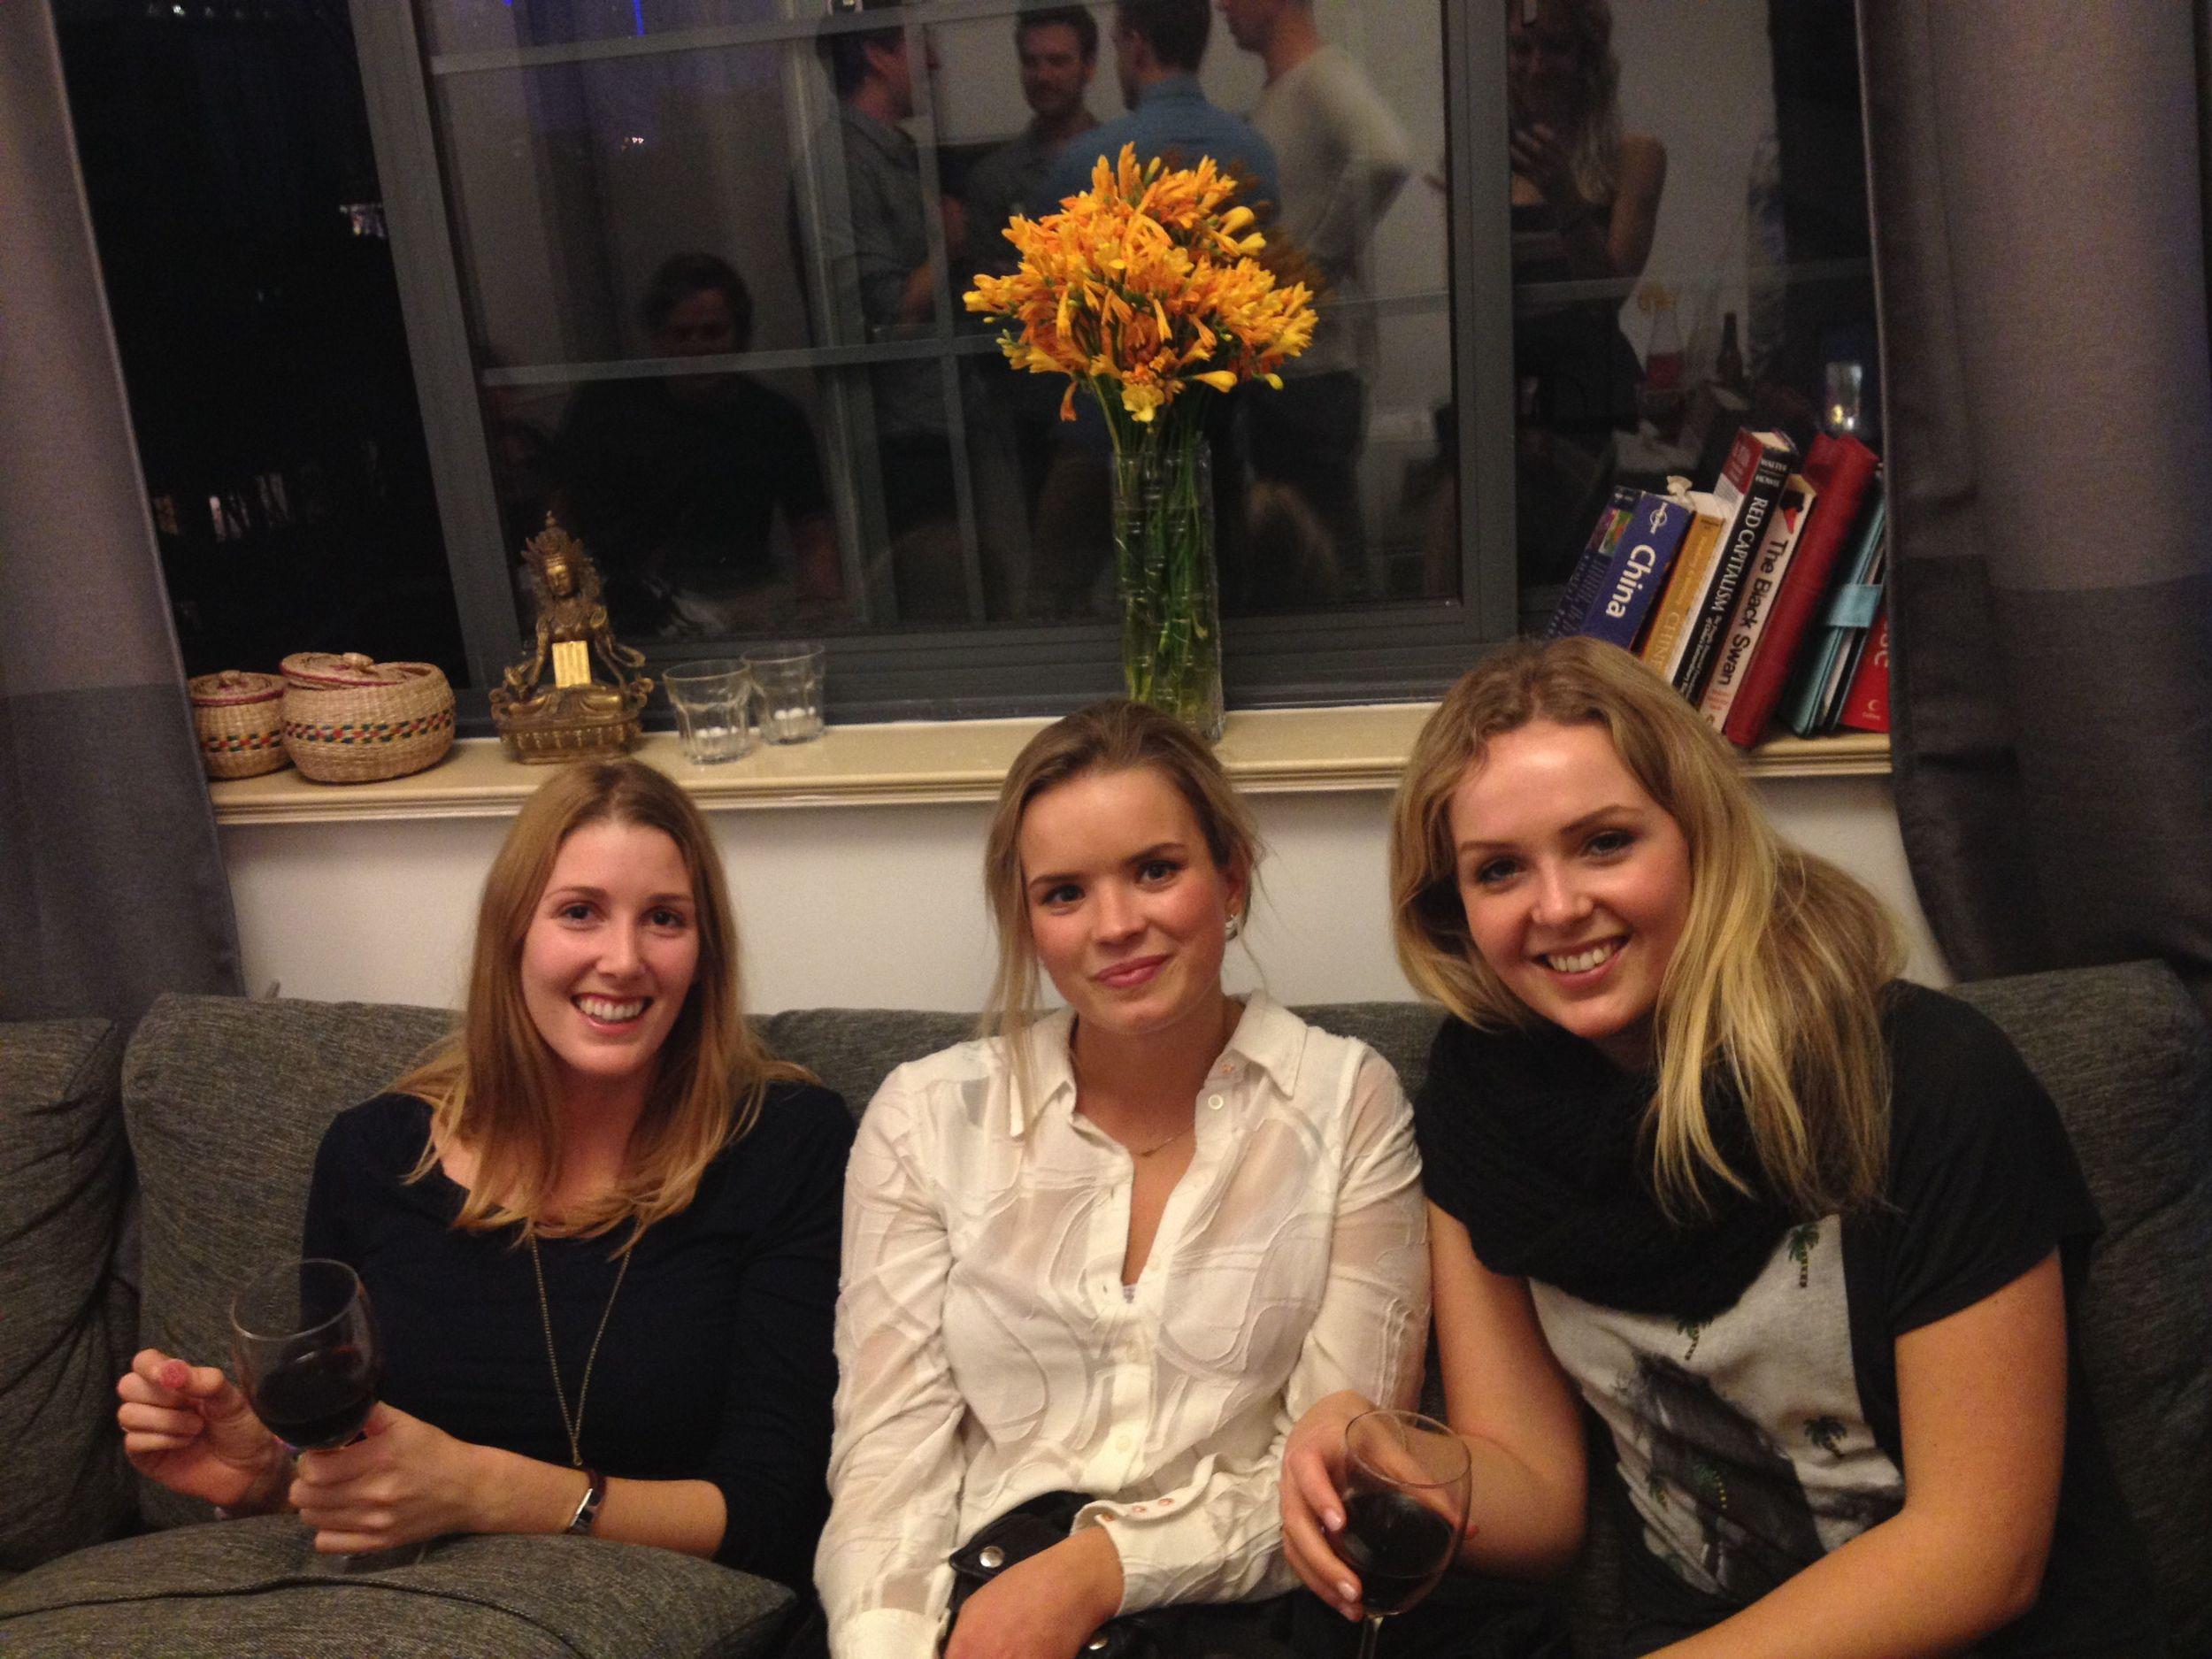 Charlot, Janie and Liv